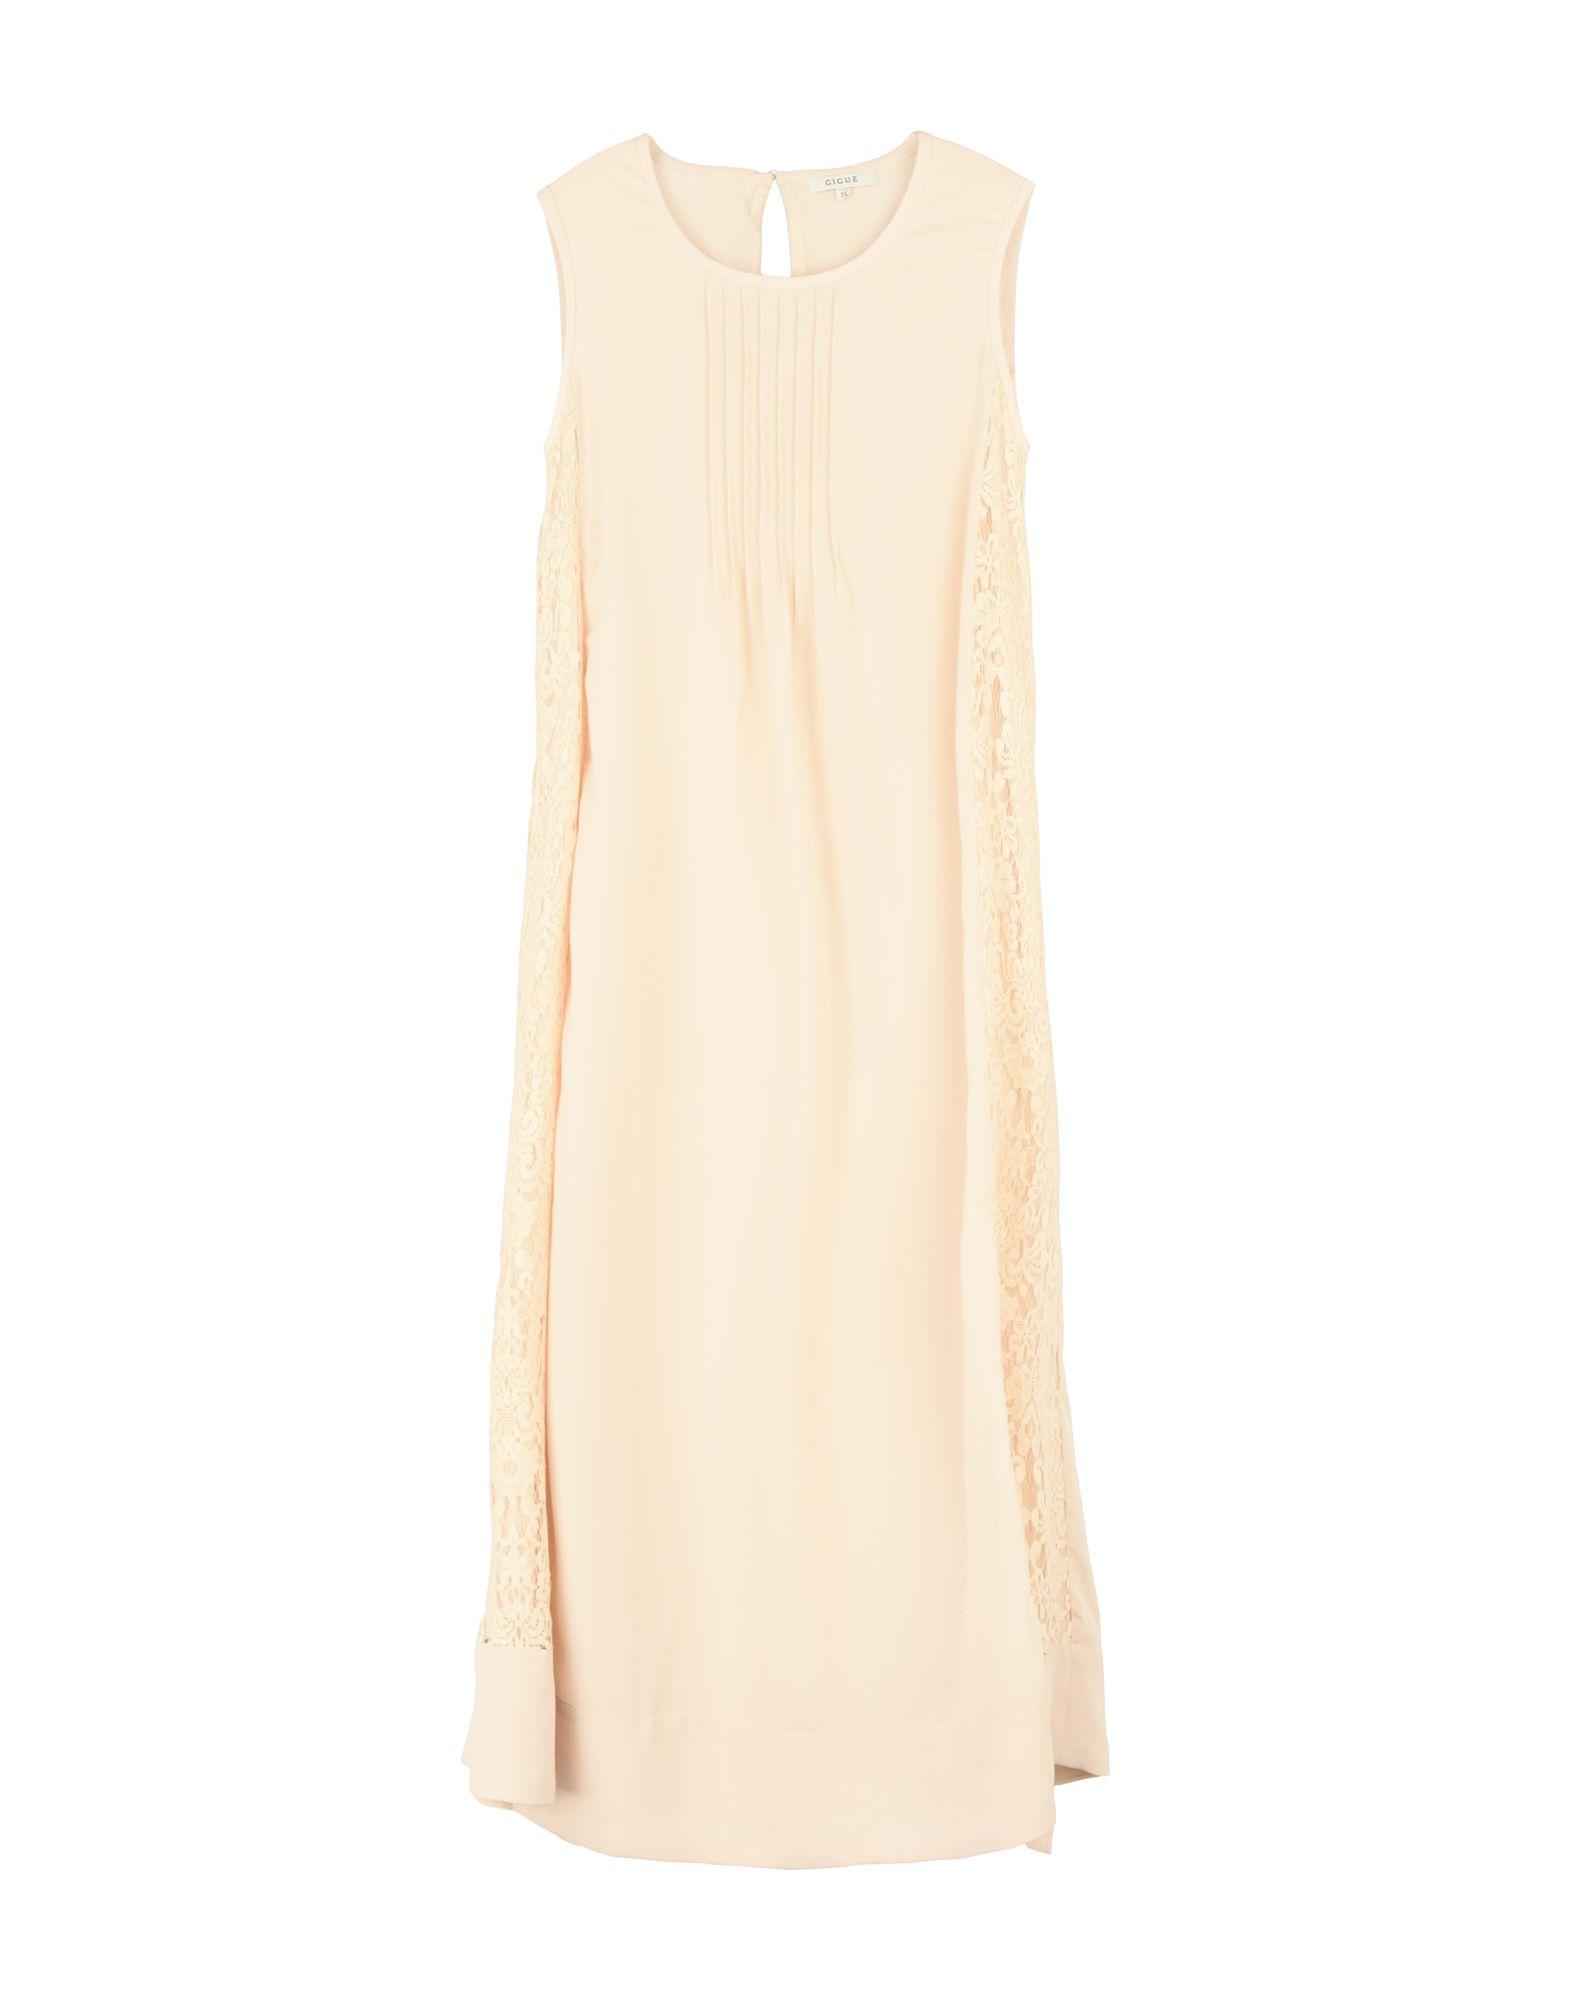 GIGUE Платье длиной 3/4 lisa corti платье длиной 3 4